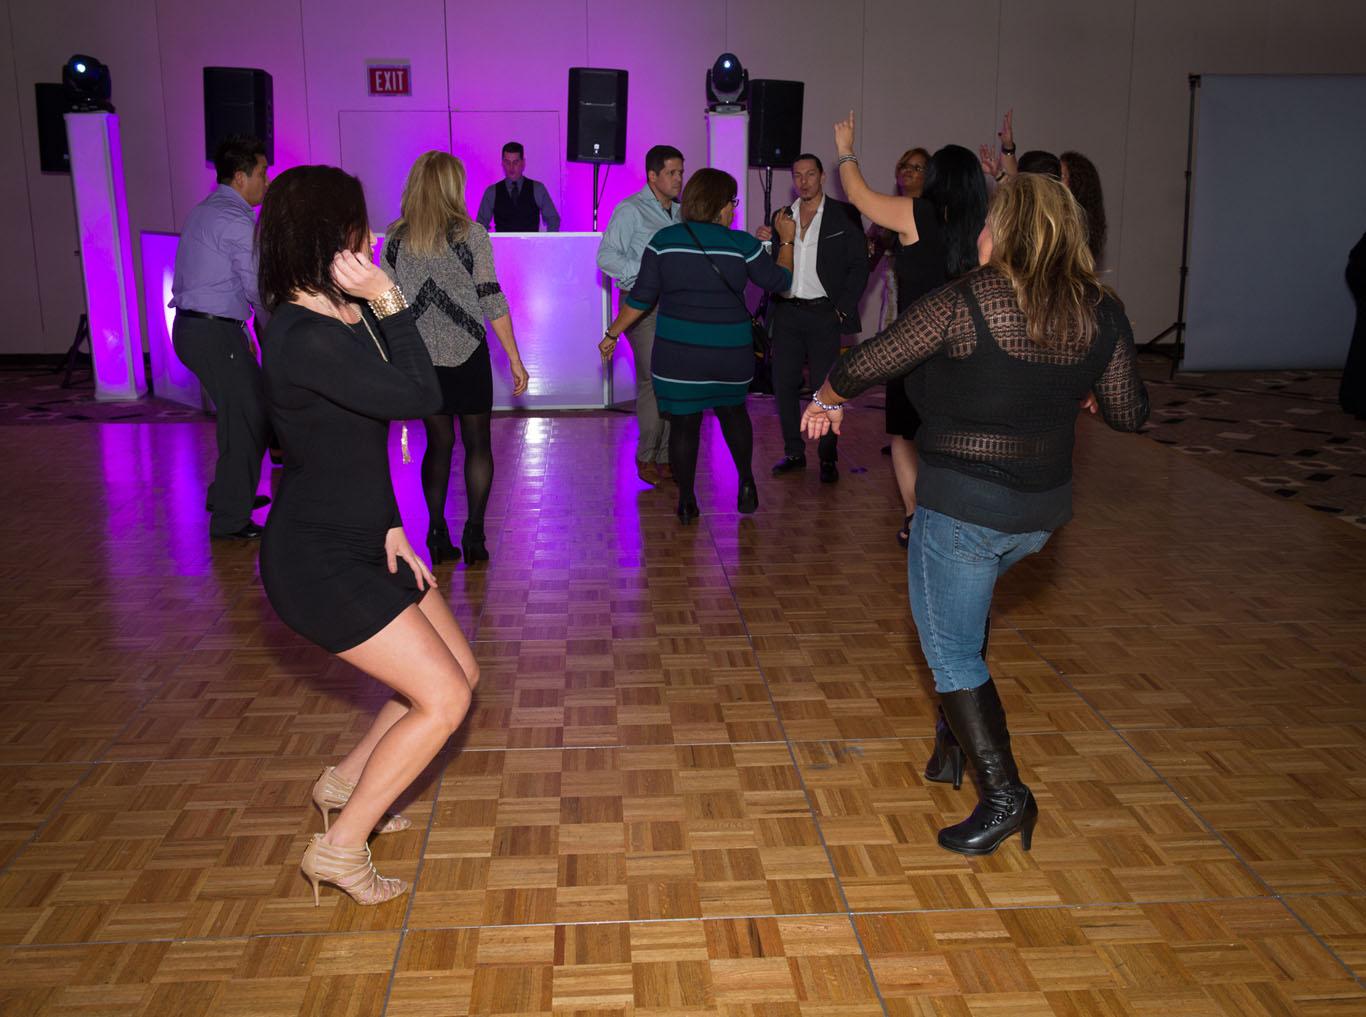 2015-12-09 ReMax Corpoarte Event - The Borgata - Atlantic City NJ - Photo Sesh - 2015-5090.jpg